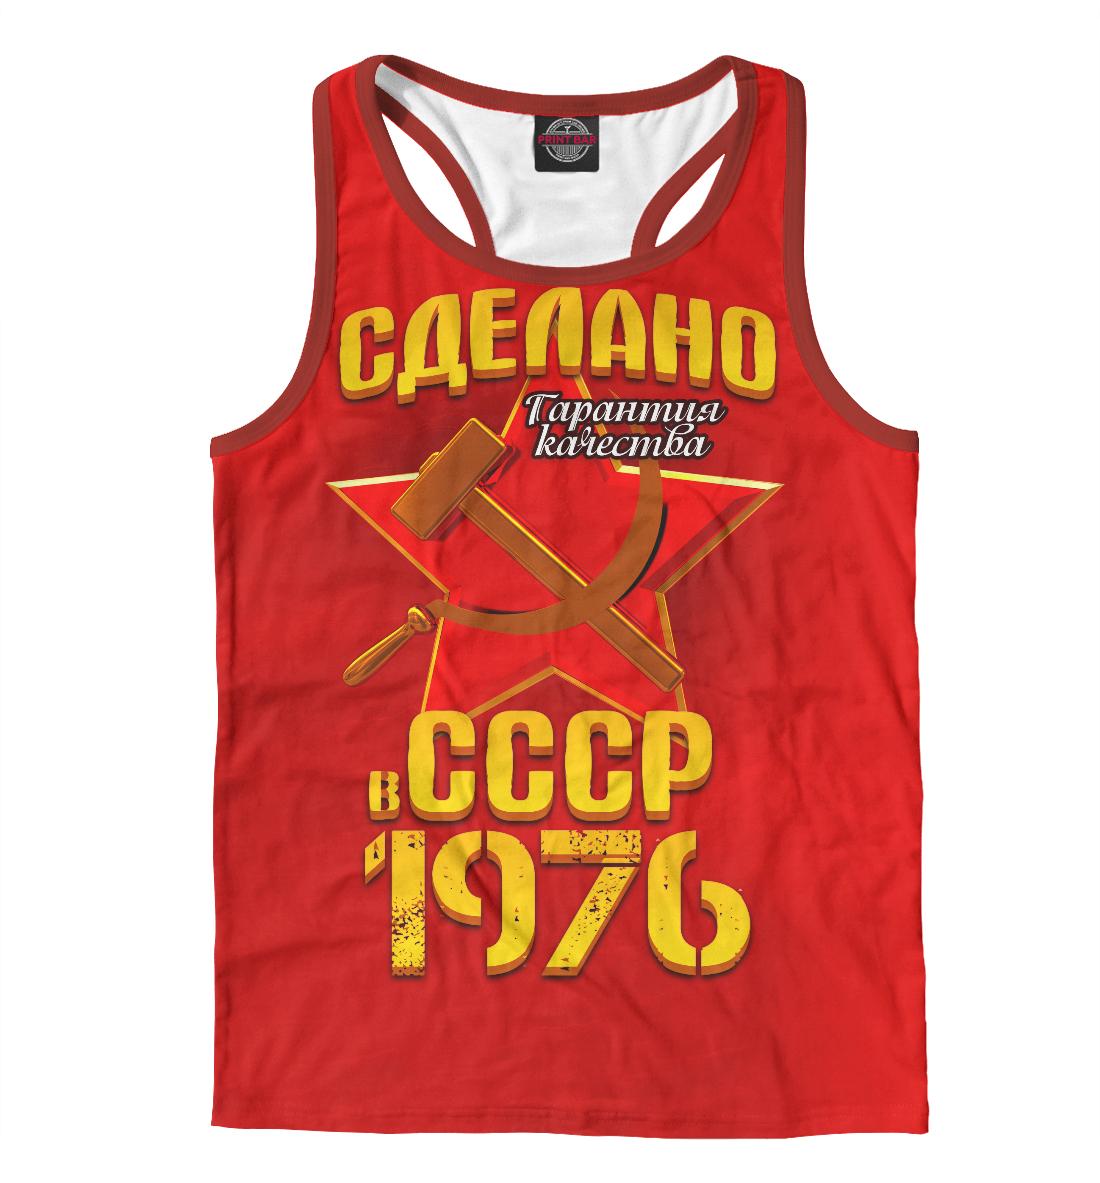 Купить Сделано в 1976, Printbar, Майки борцовки, DSS-575225-mayb-2